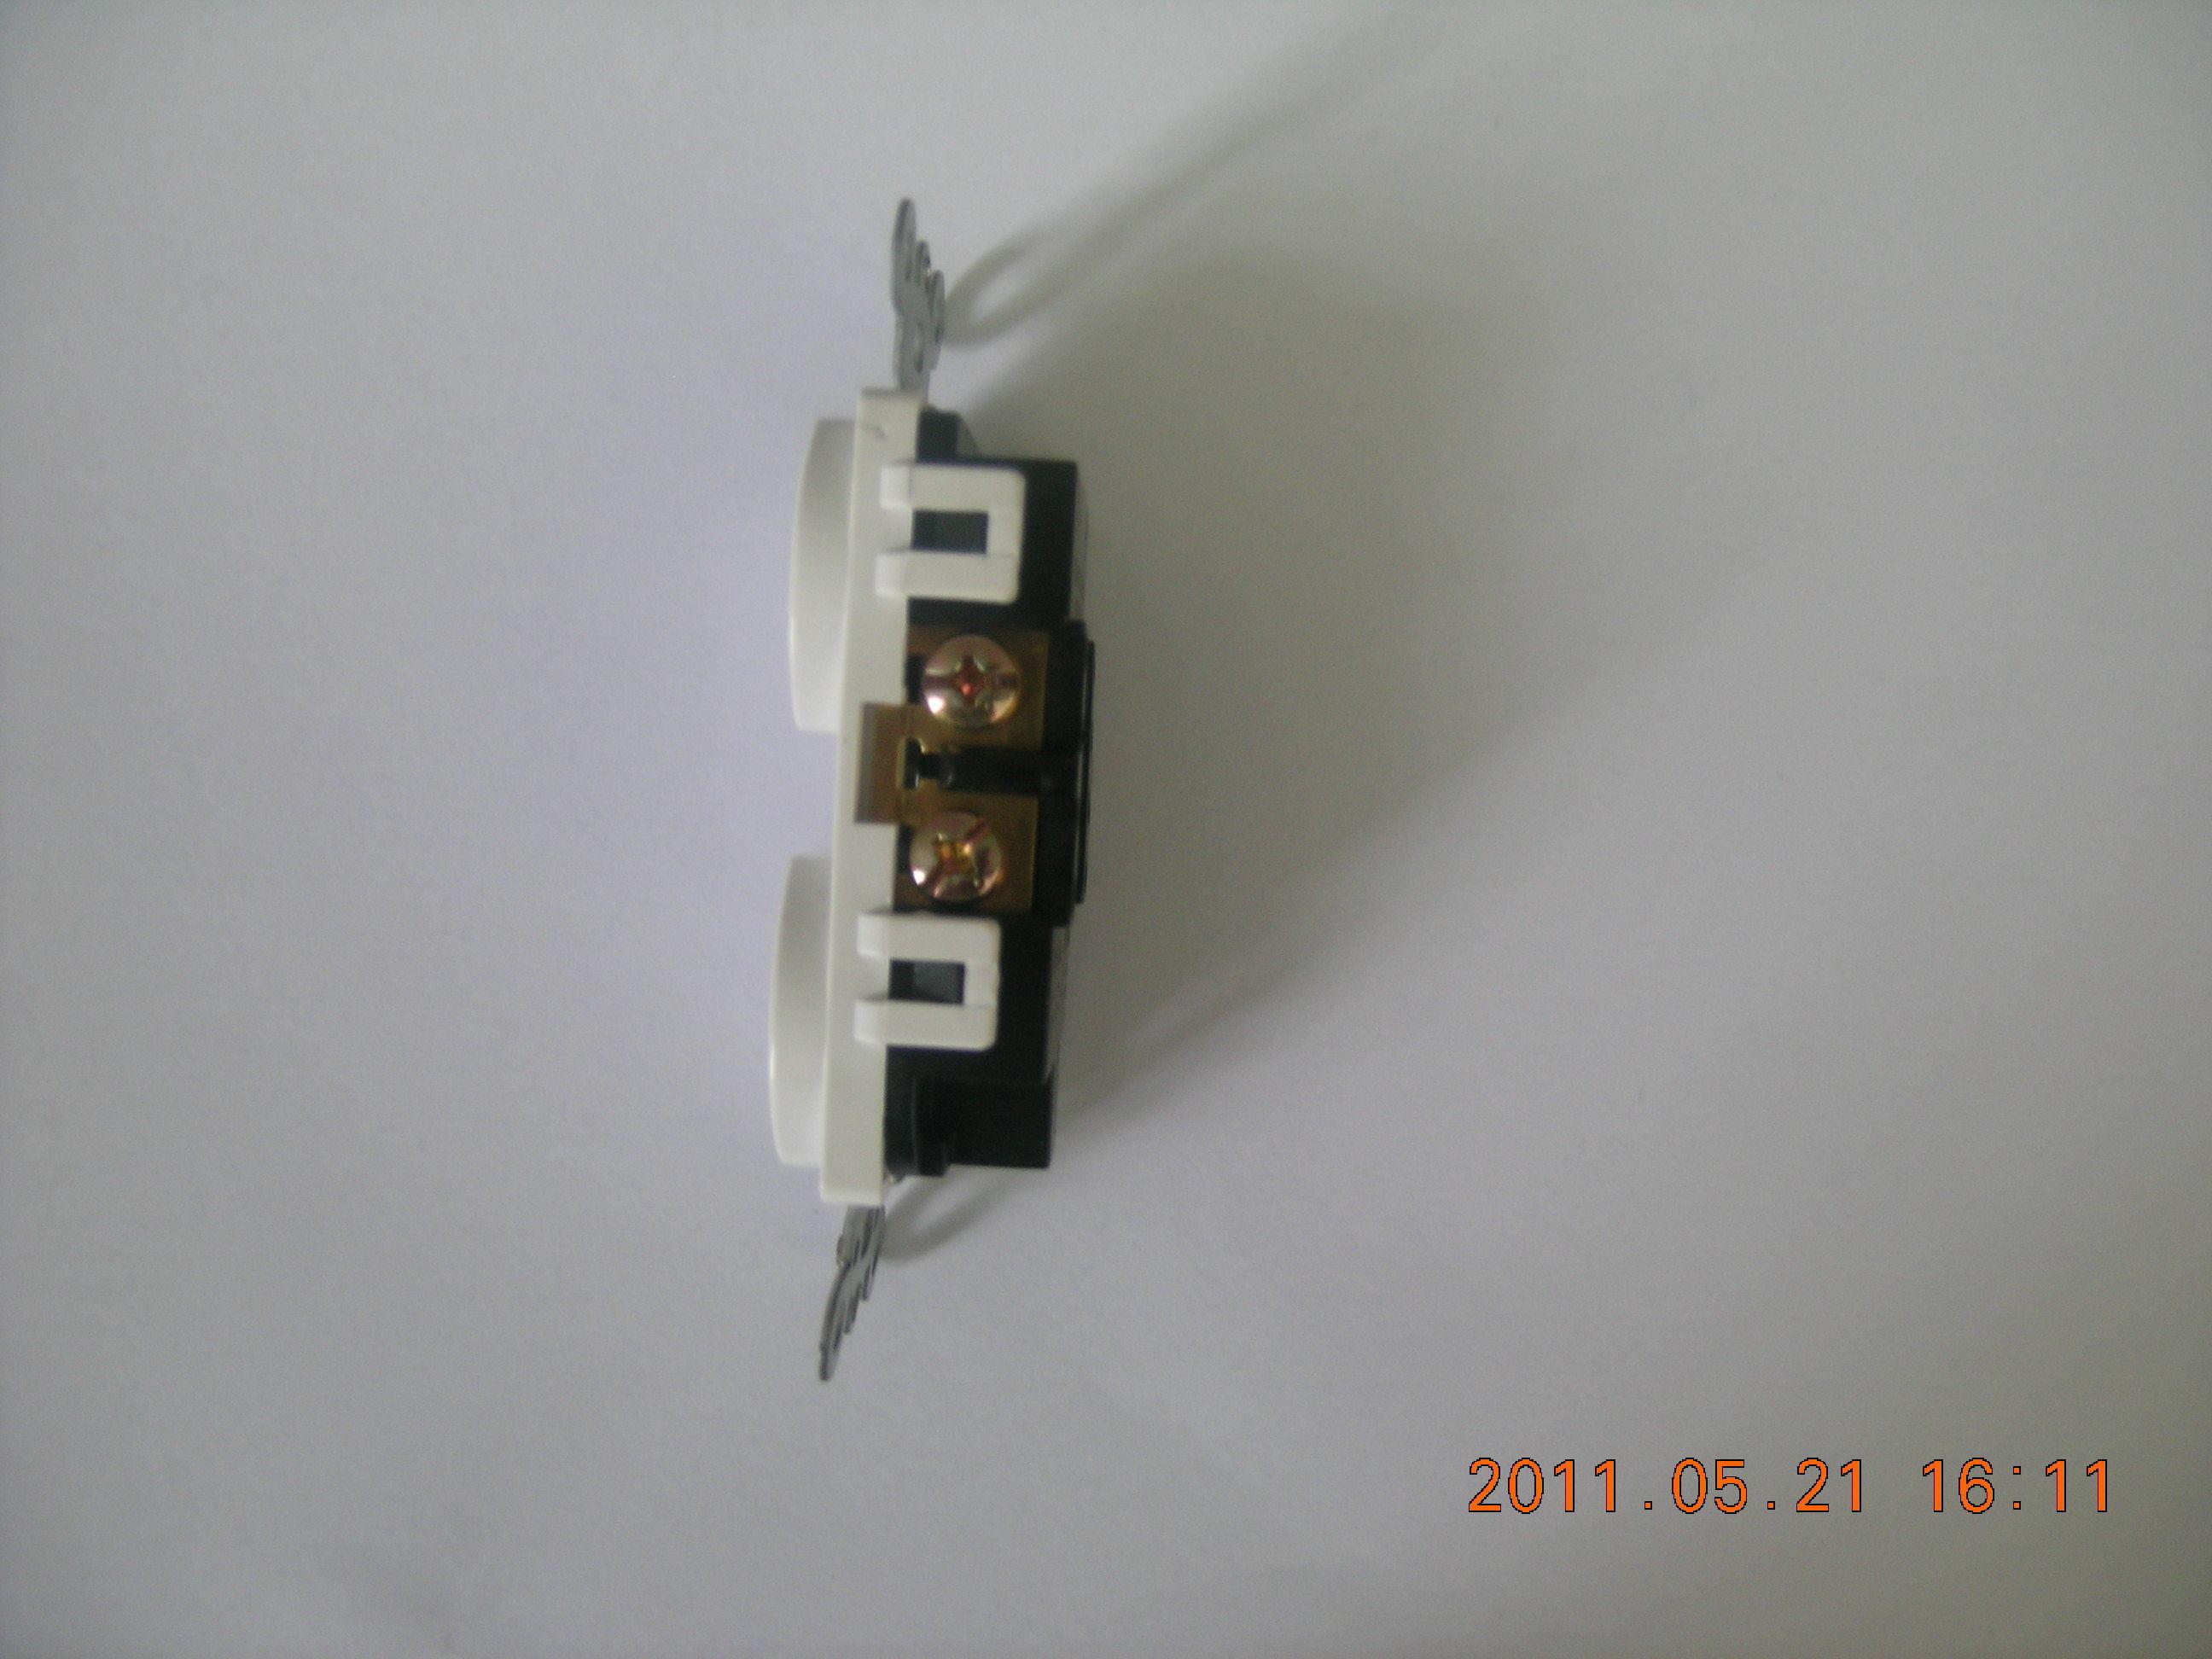 Standard Duplex Receptacle, Straight Blade, Residential Grade, 15 a, 125VAC, NEMA 5-15r, UL Listing